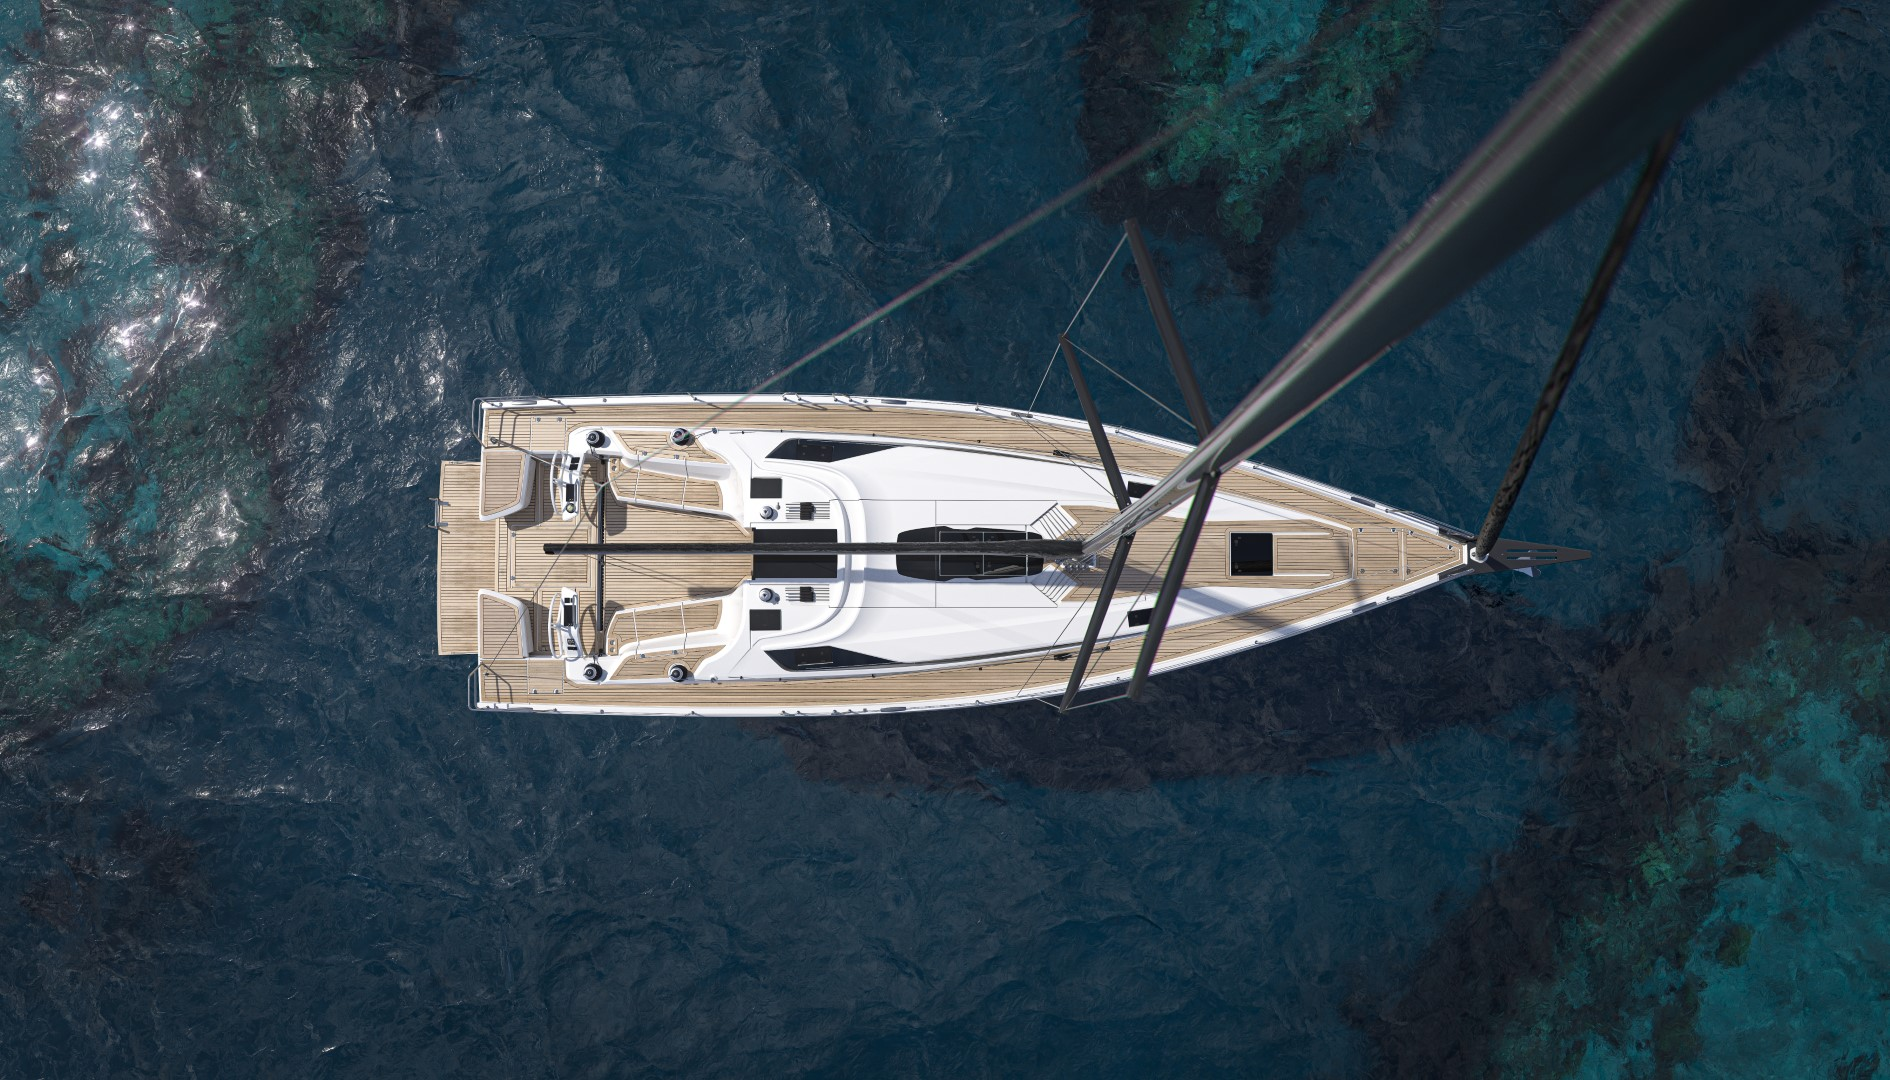 Elan E6 perfromance cruiser top-down view